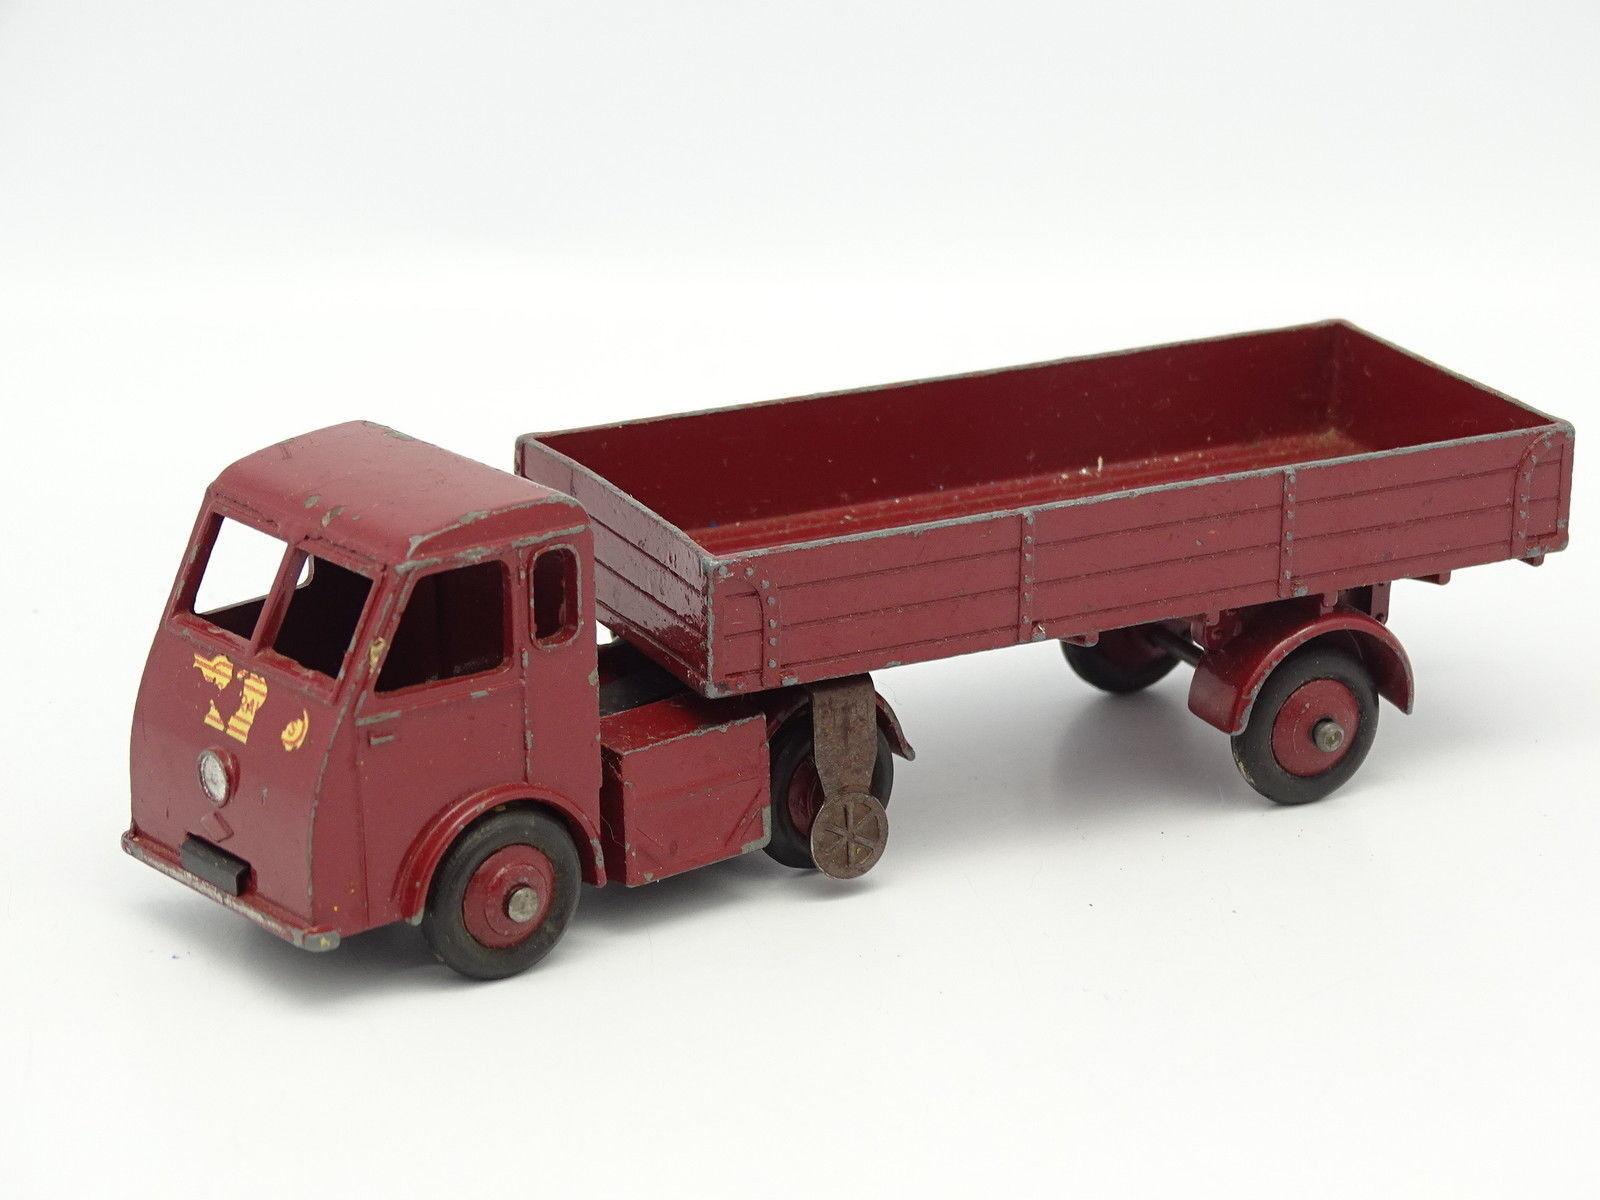 Dinky toys gb sb 1 43 - hindle smart Helecs british rail 30w